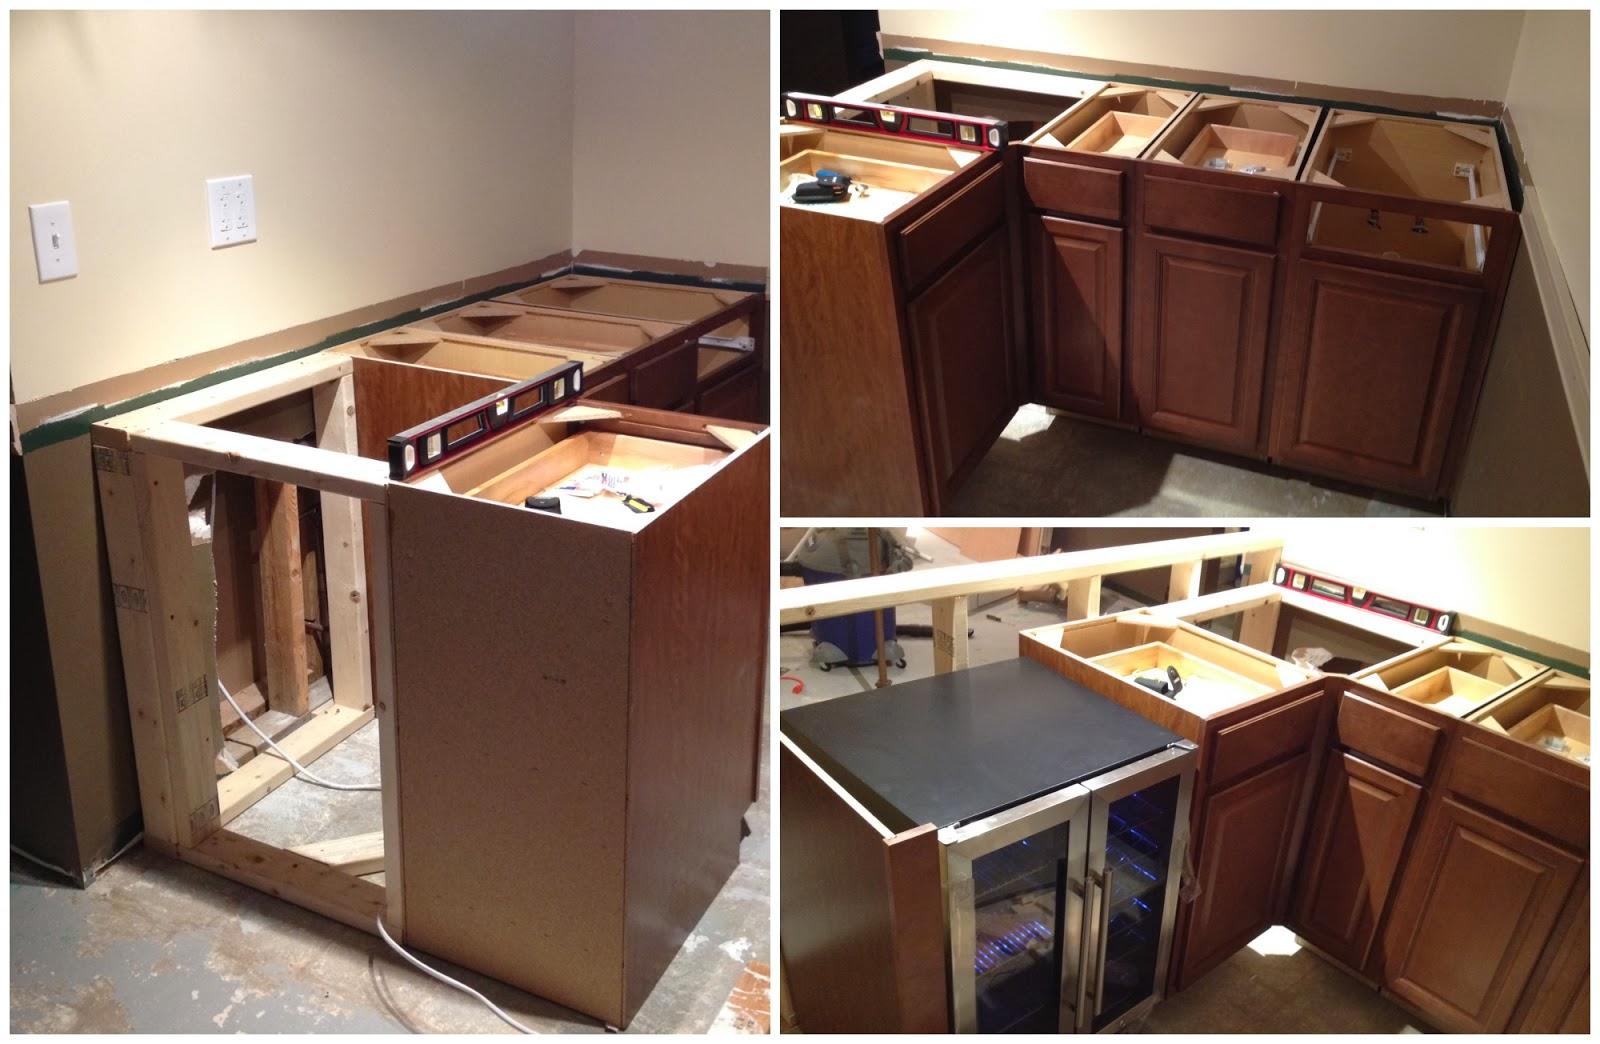 doors theorem define wet lowes salary depot sofa decorator cabinets cabinet interior bar chicago designer home angles